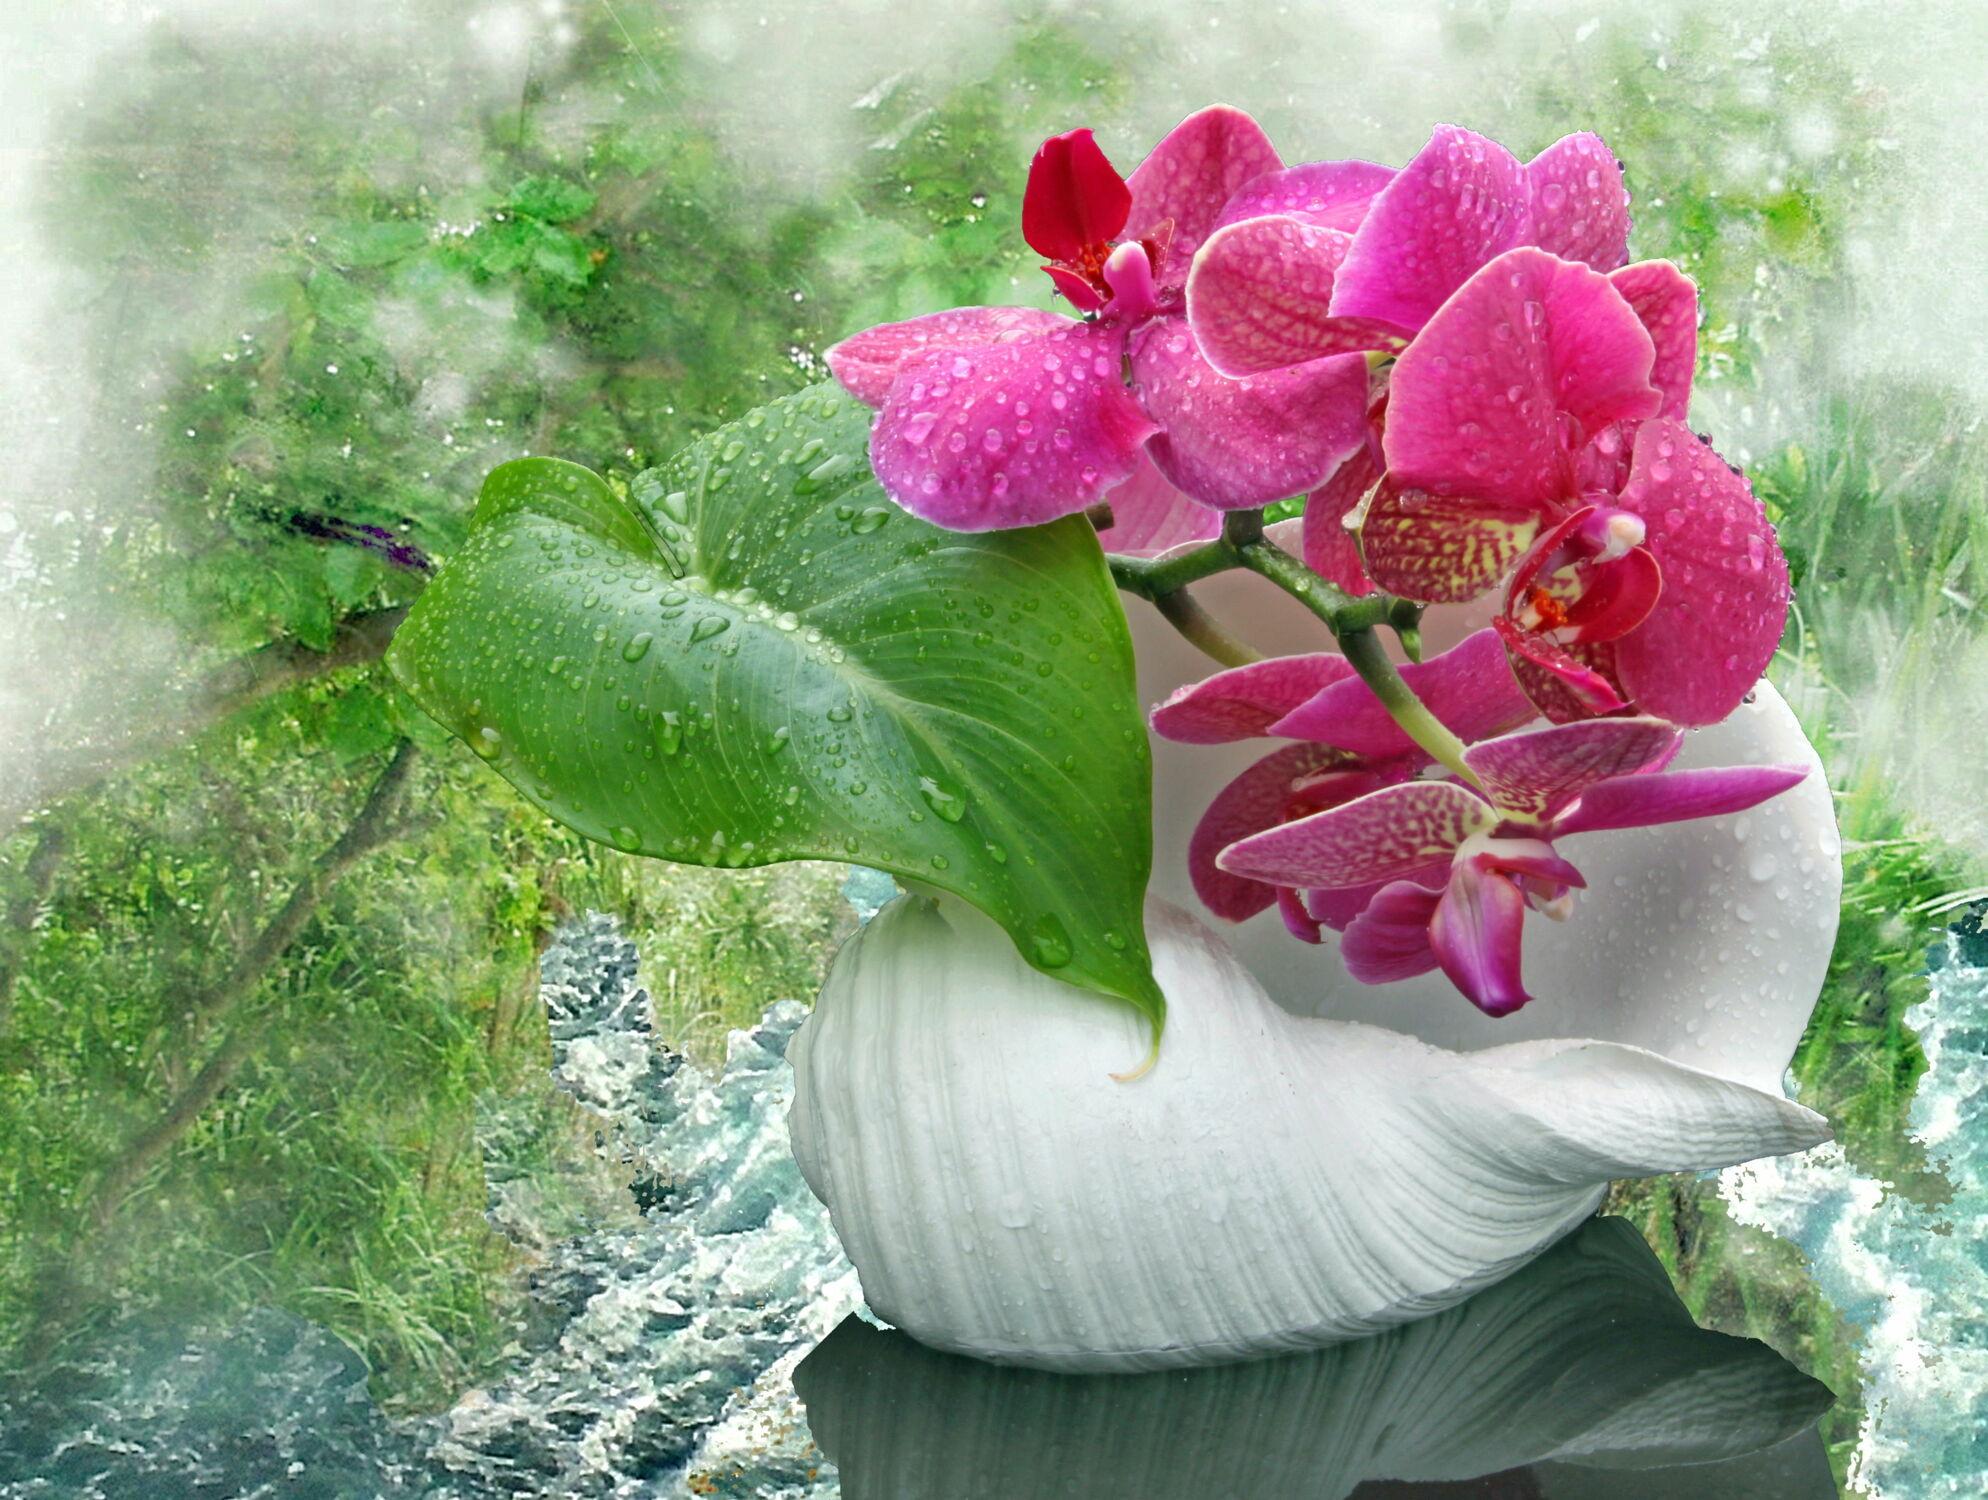 Bild mit Orchideen, Blume, Orchidee, Pflanze, Muschel, Floral, Florales, garten, blüte